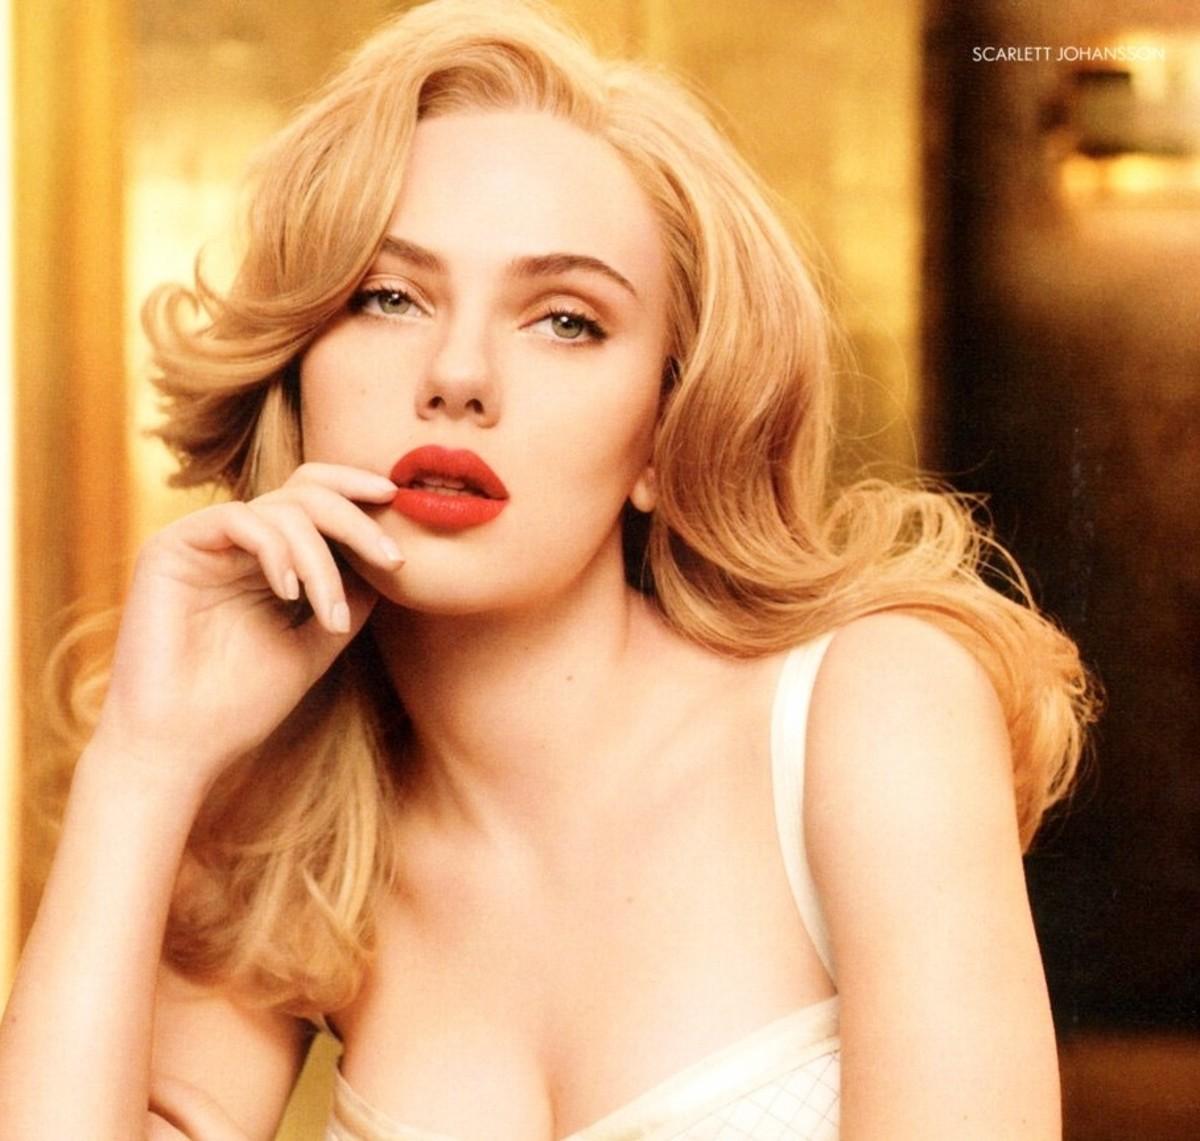 Scarlett Johannson with pale skin like a cherub. Pale is Beautiful: Praising the Ethereal Beauty of Fair Skin.